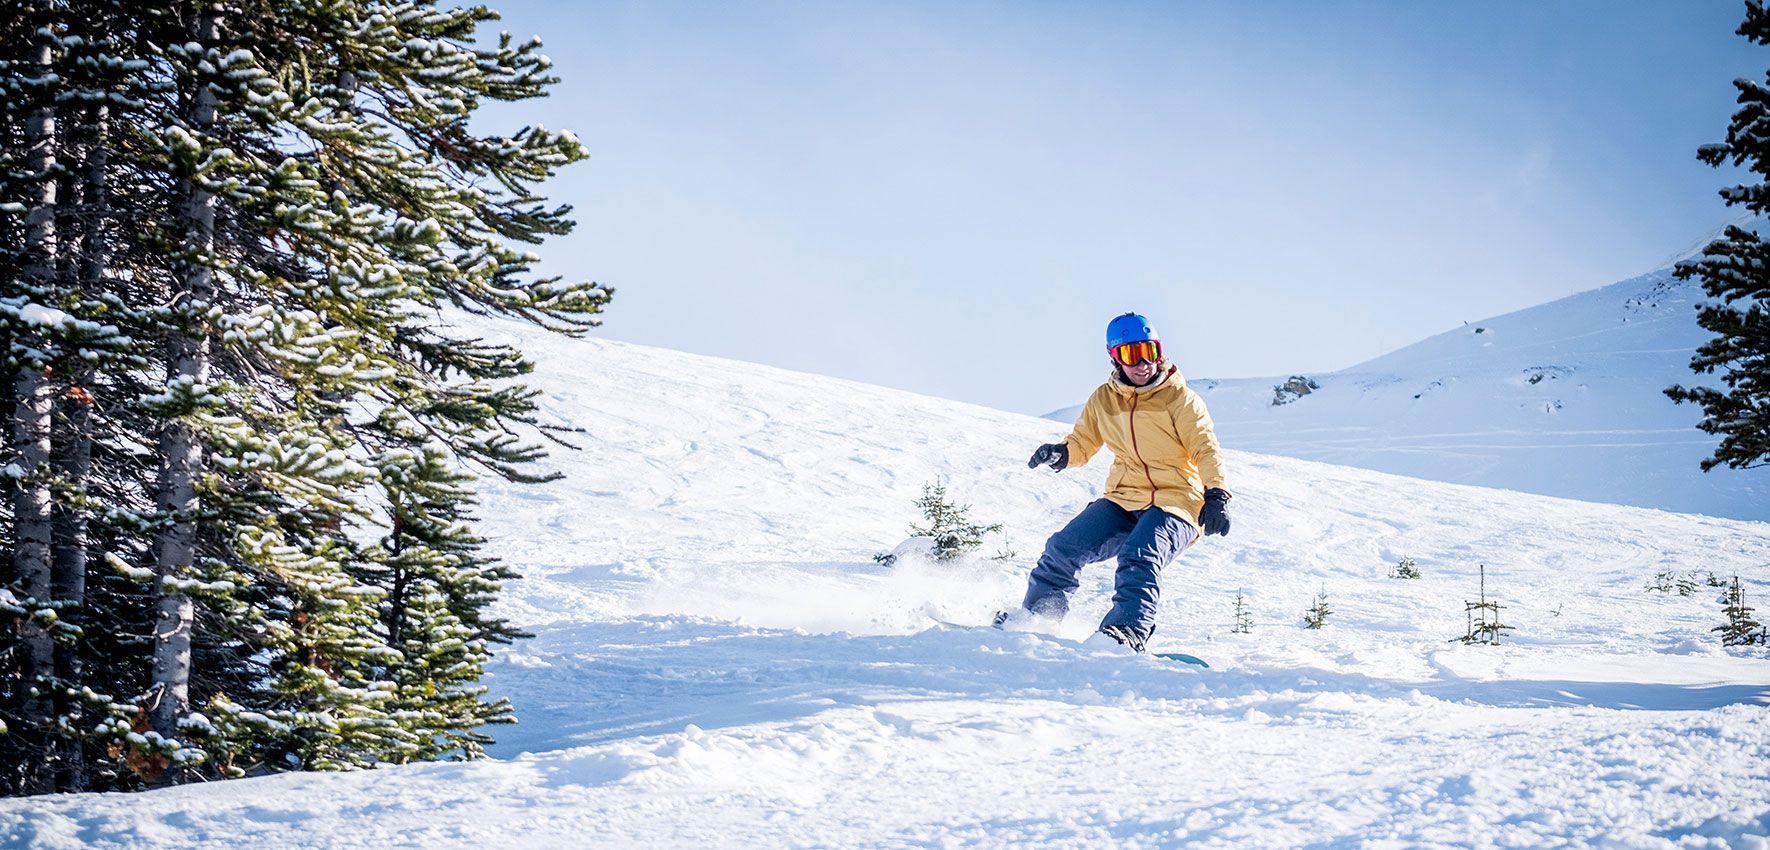 jasper-kanada-winter-snowboarden